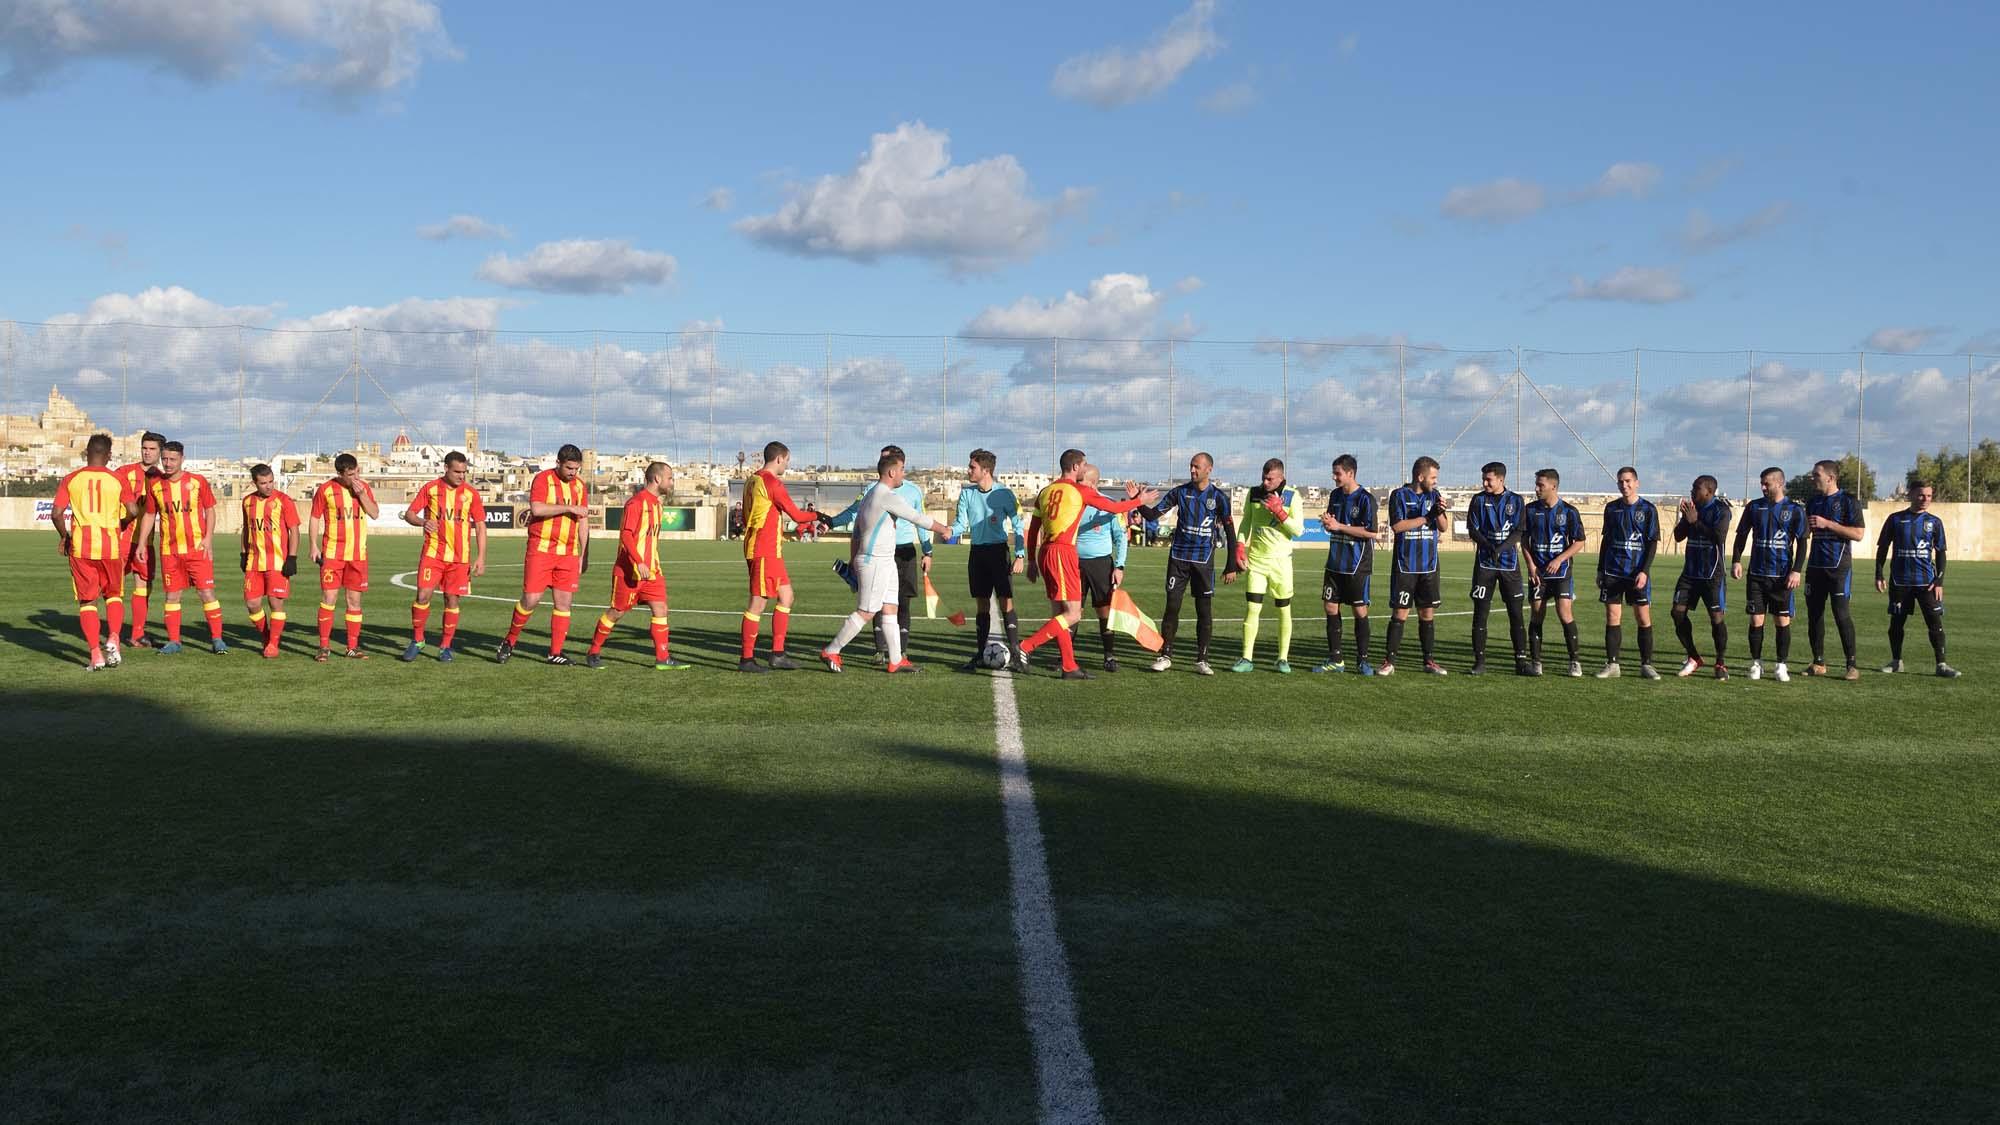 Xaghra United vs St Lawrence Spurs